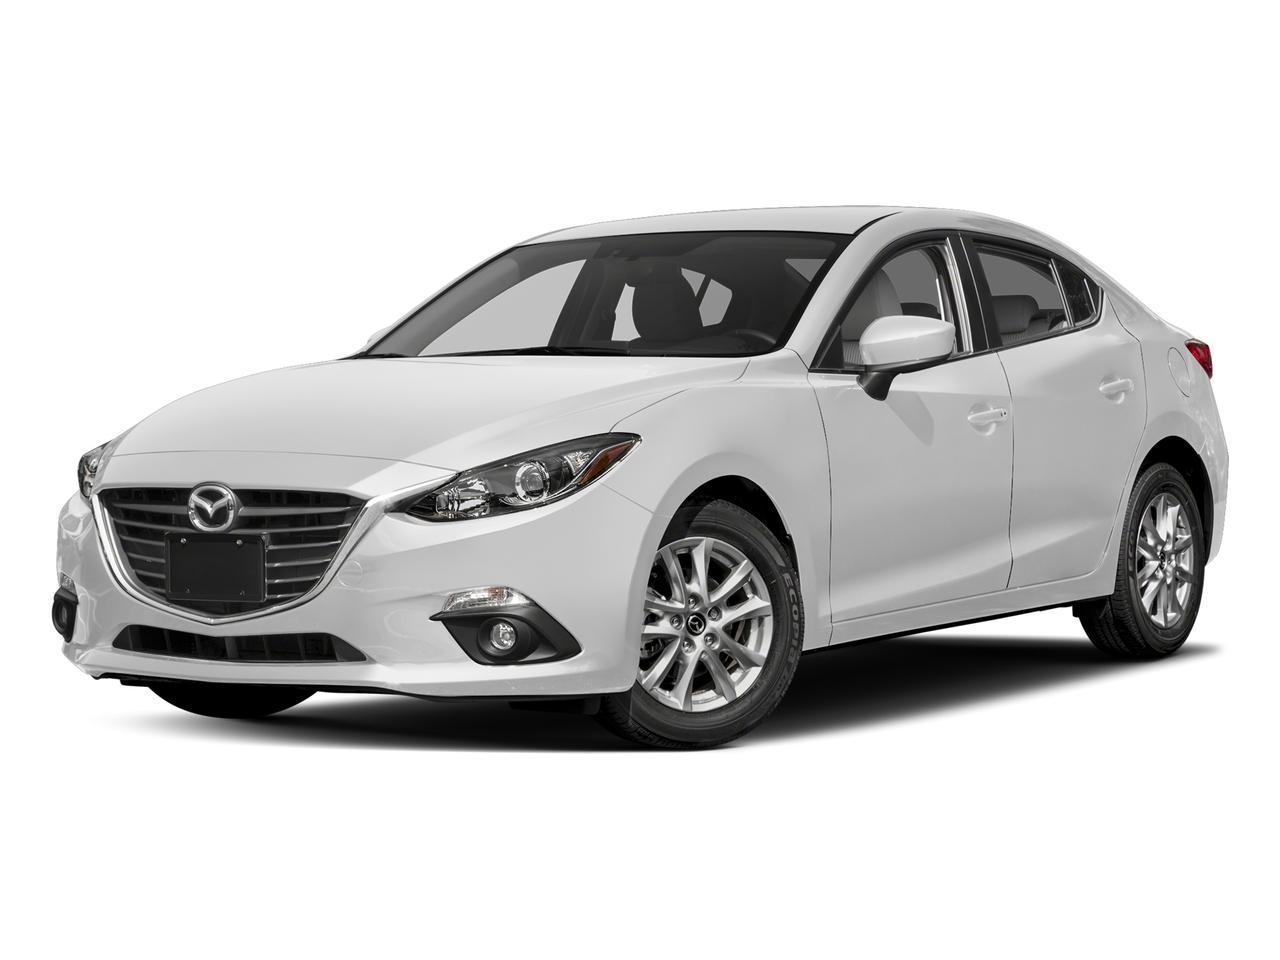 2016 Mazda Mazda3 Vehicle Photo in Houston, TX 77074